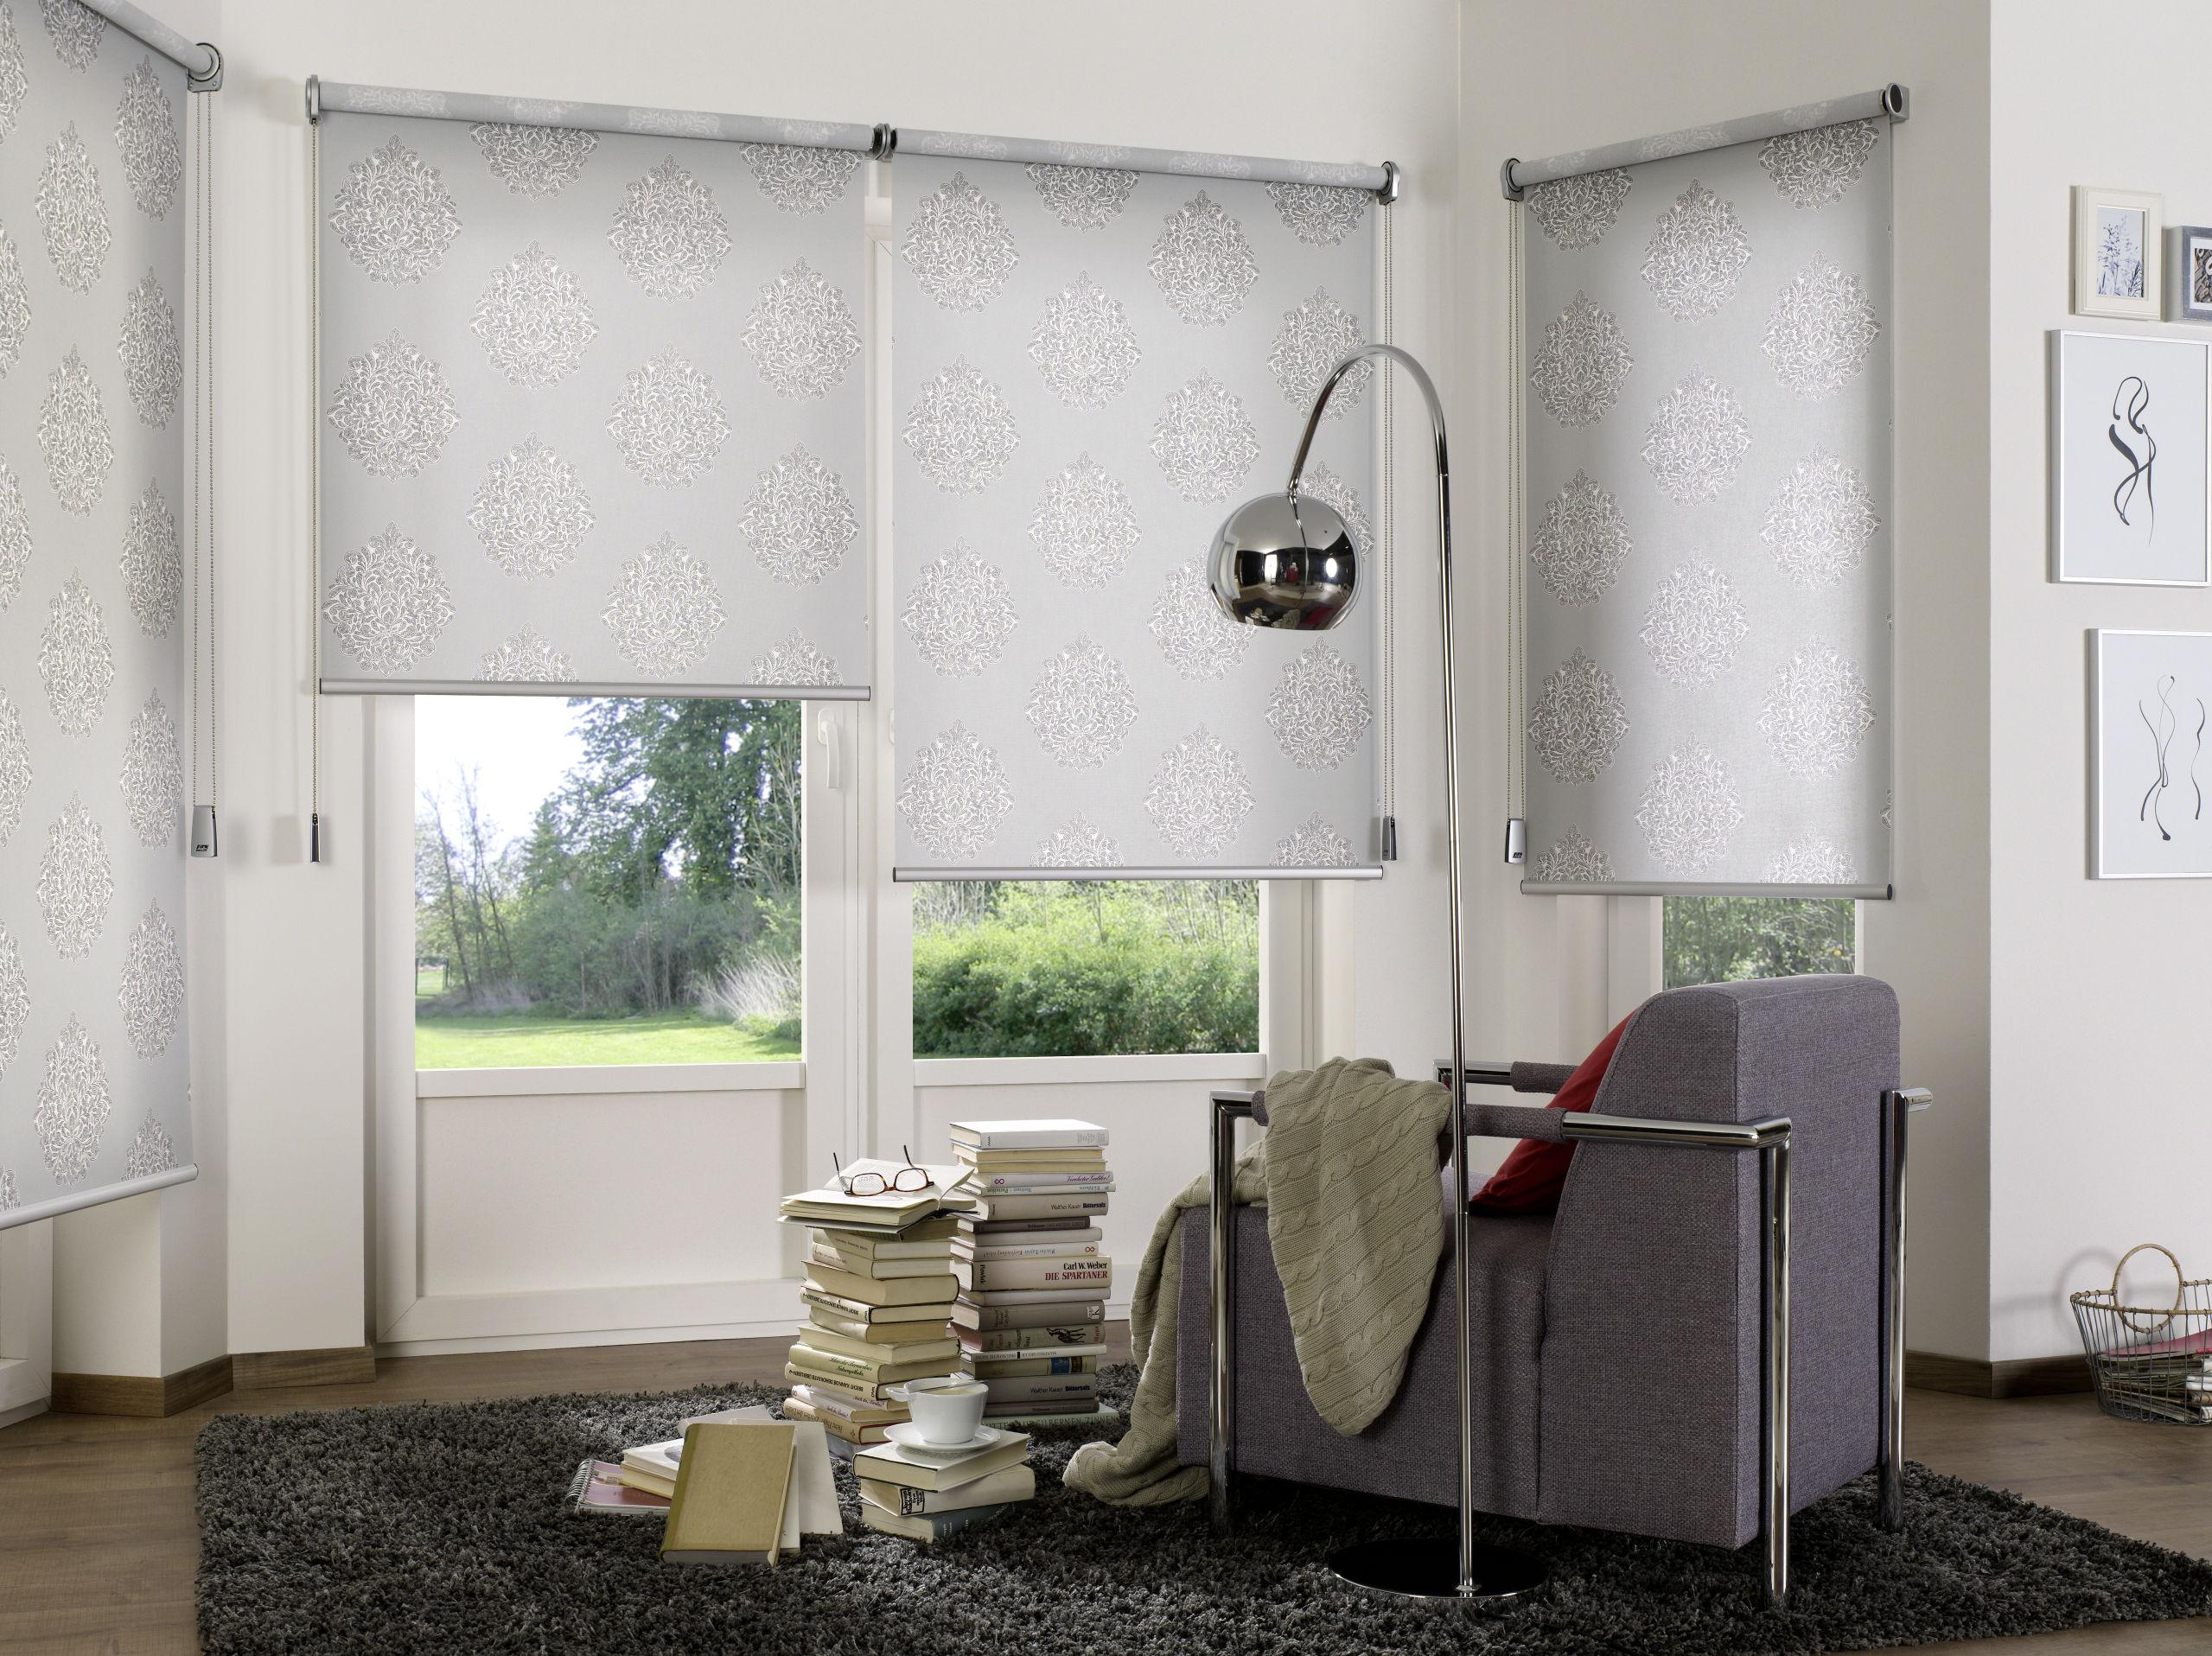 rollo grau interesting rollos gnstig kaufen in birnbach im westerwald bei ak with rollo grau. Black Bedroom Furniture Sets. Home Design Ideas